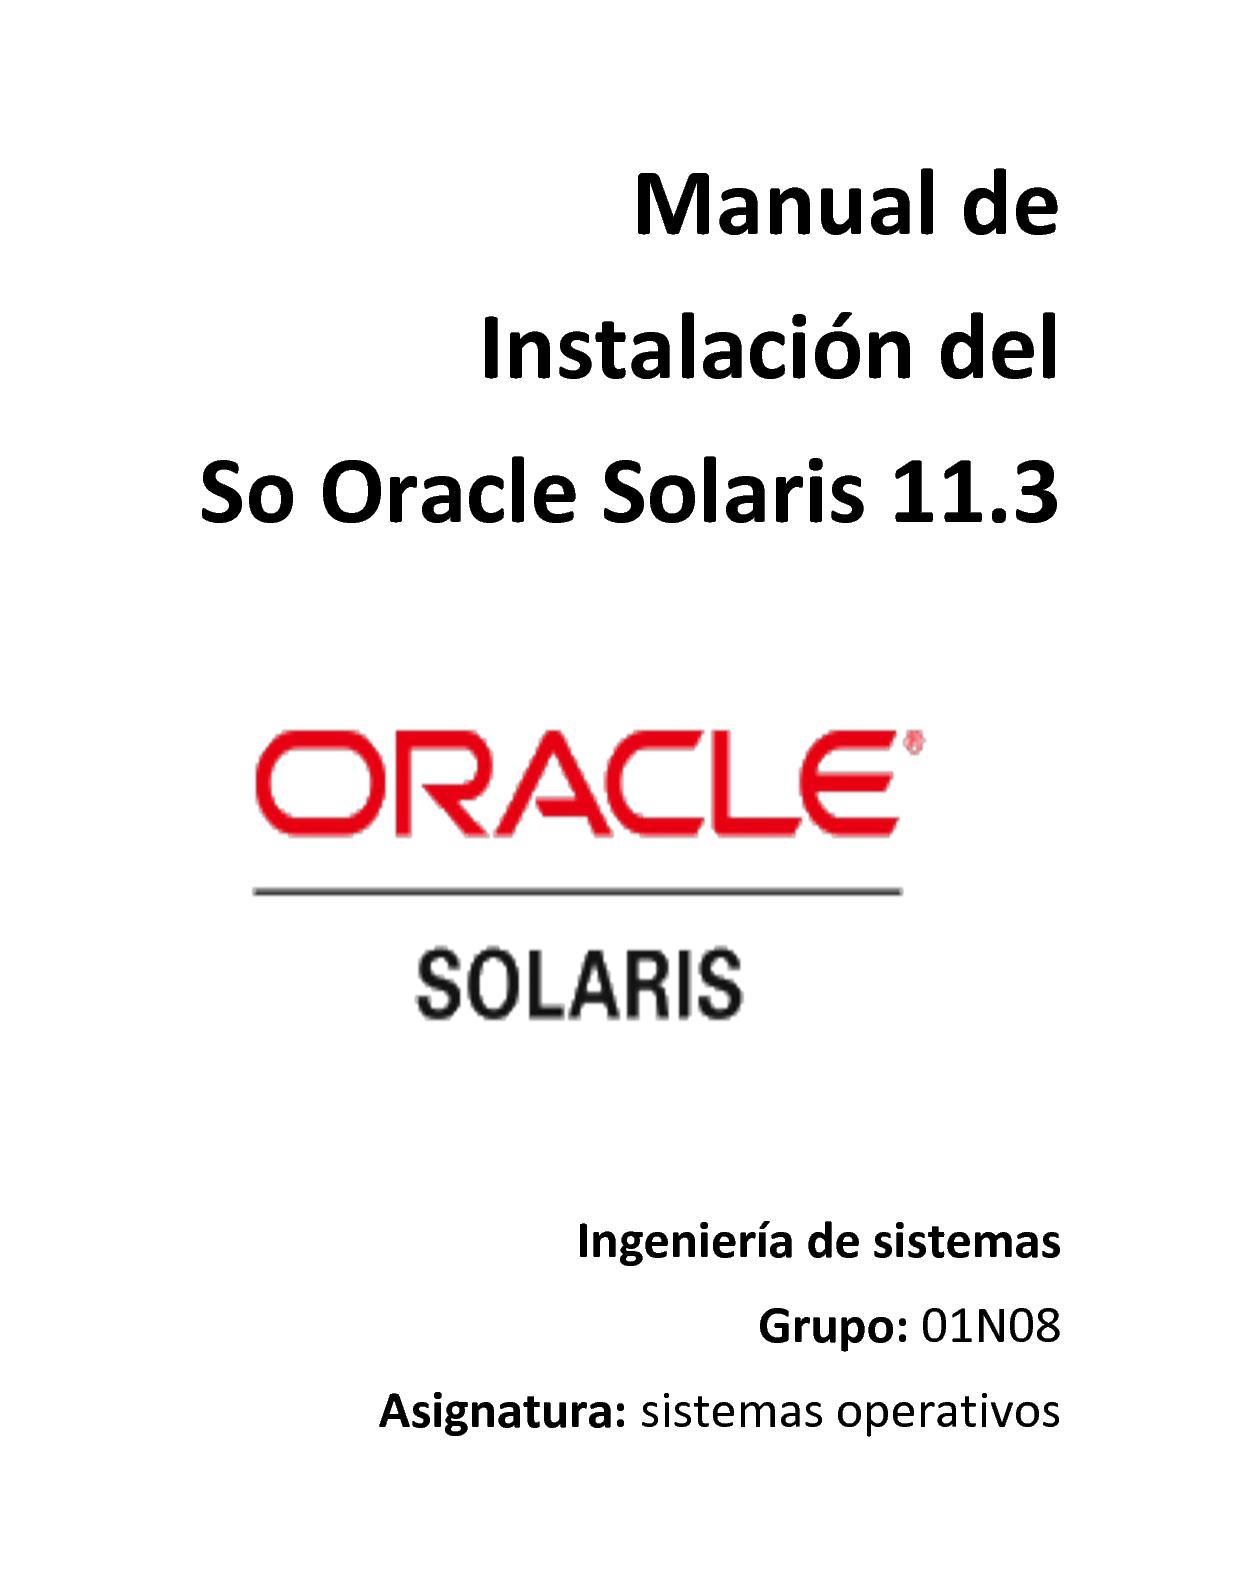 Solaris OS